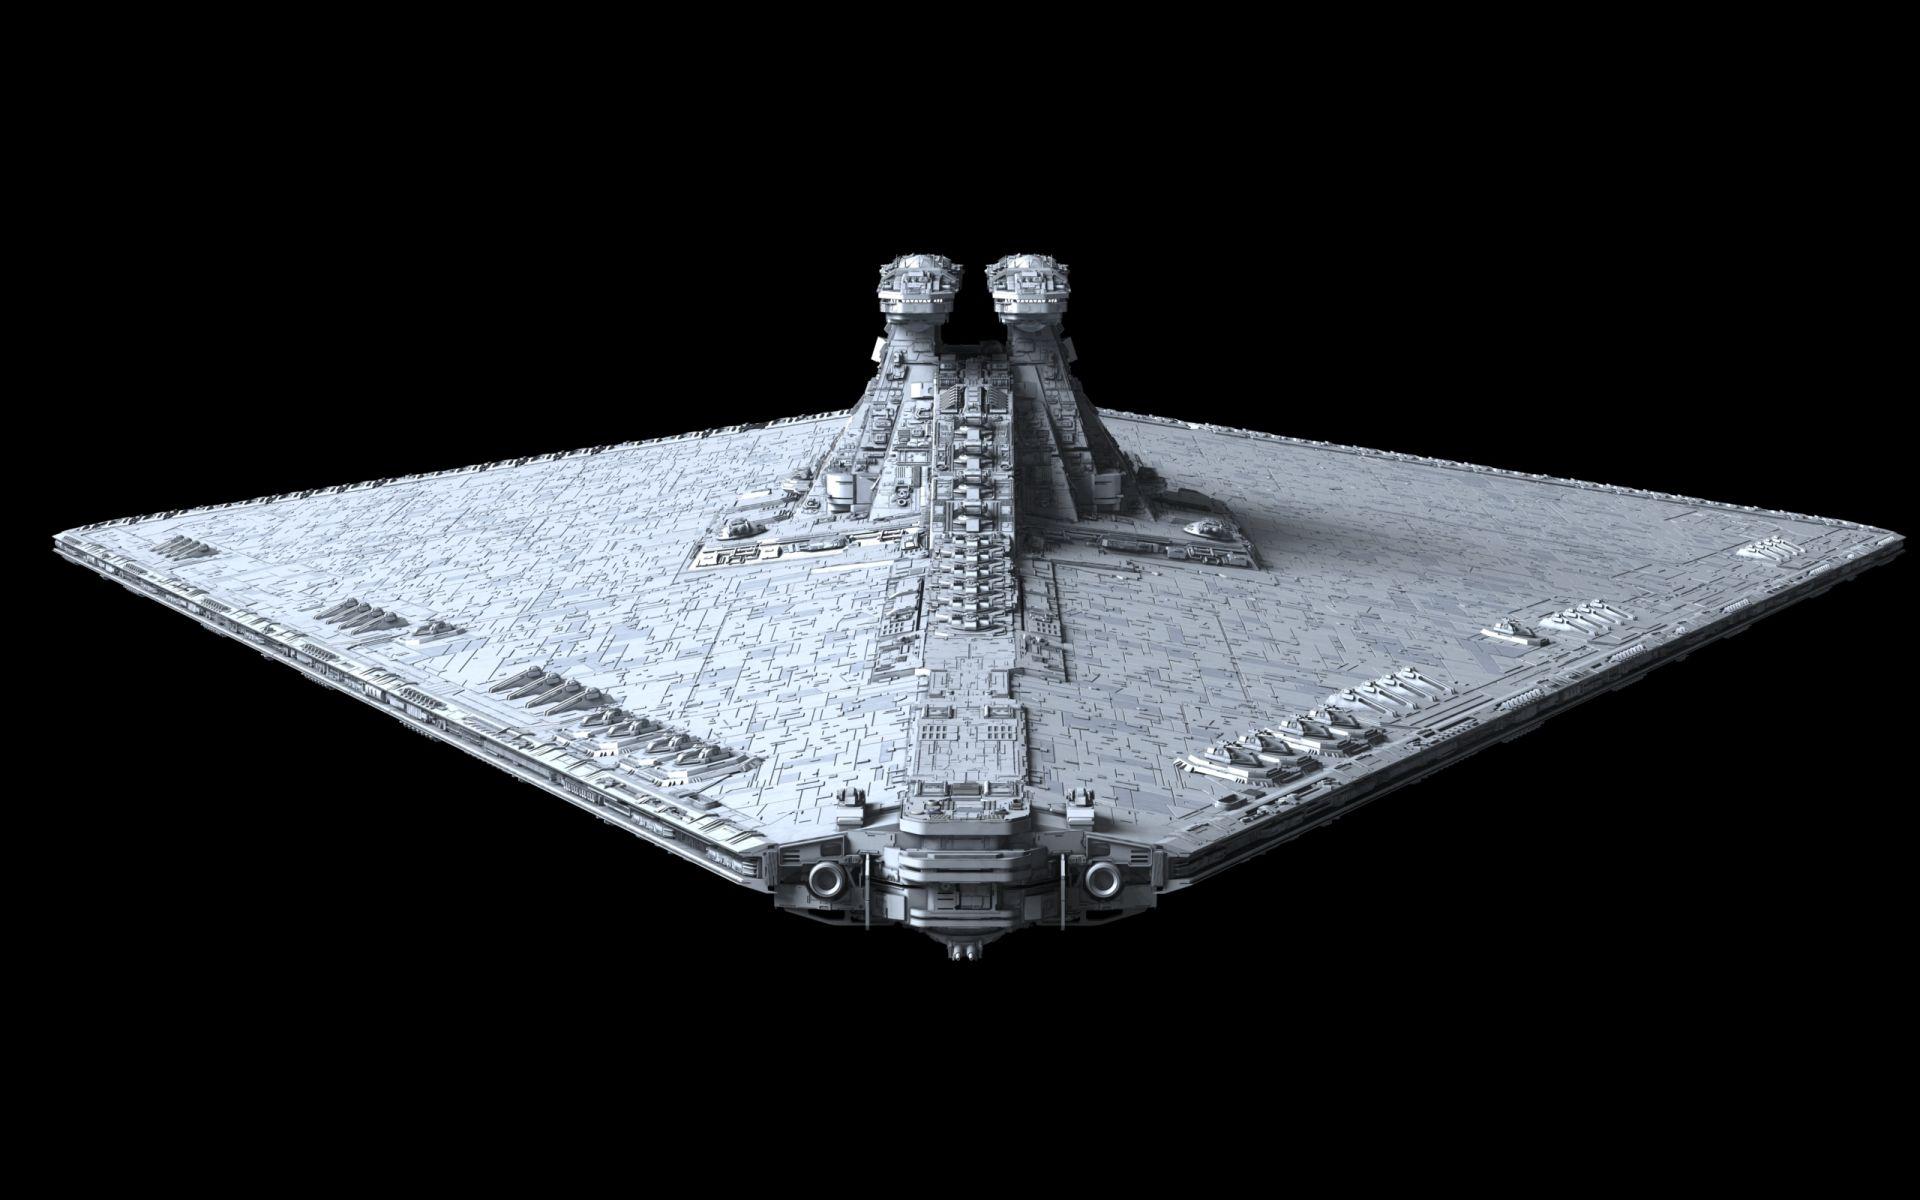 Star Wars Screensaver Wallpaper